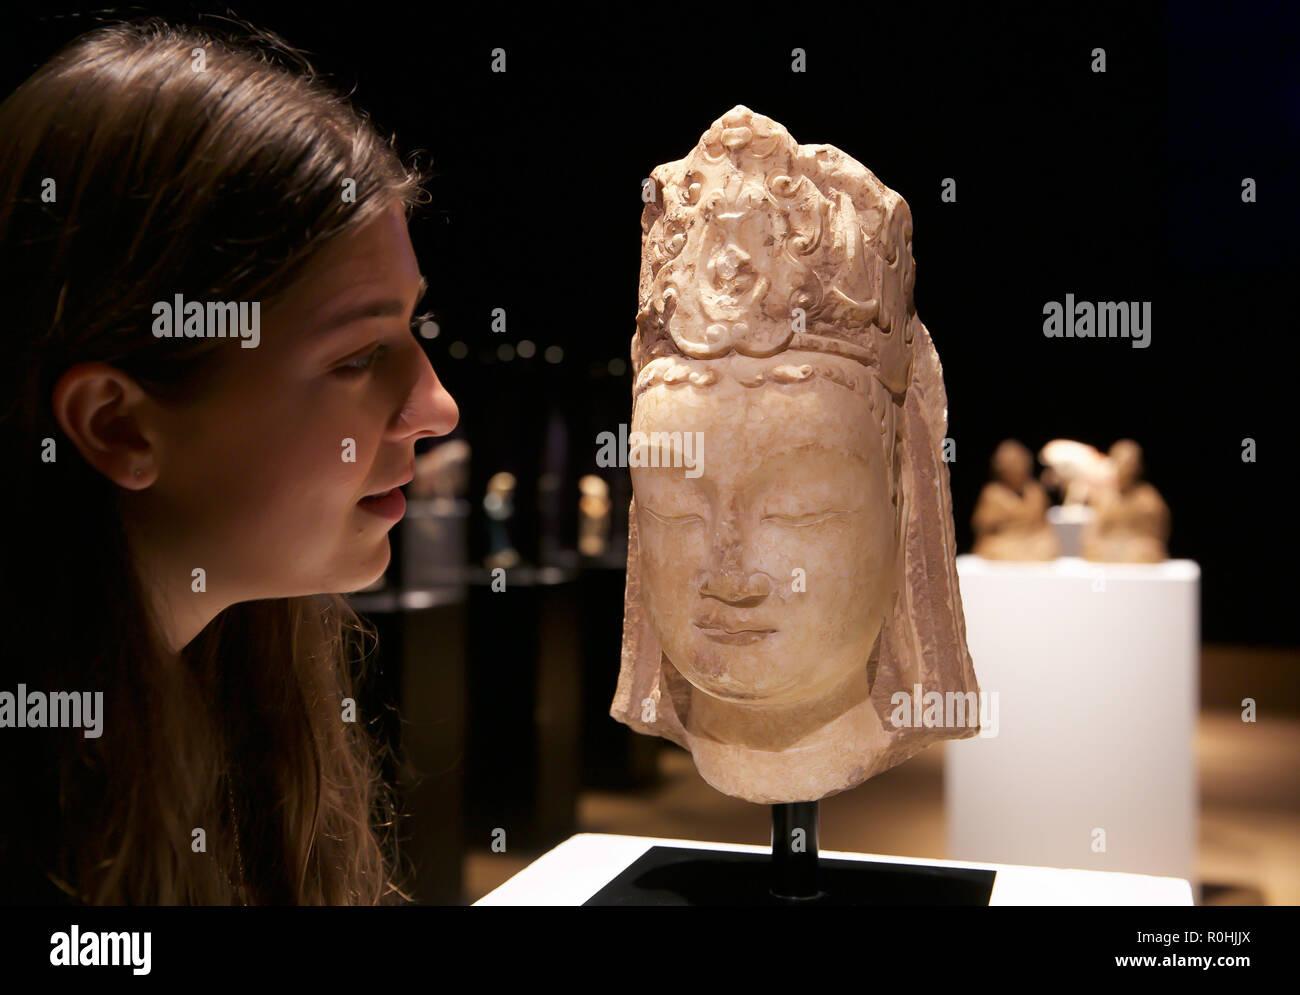 Northern Qi Dynasty Photos   Northern Qi Dynasty Images - Alamy 339cd94f7d8